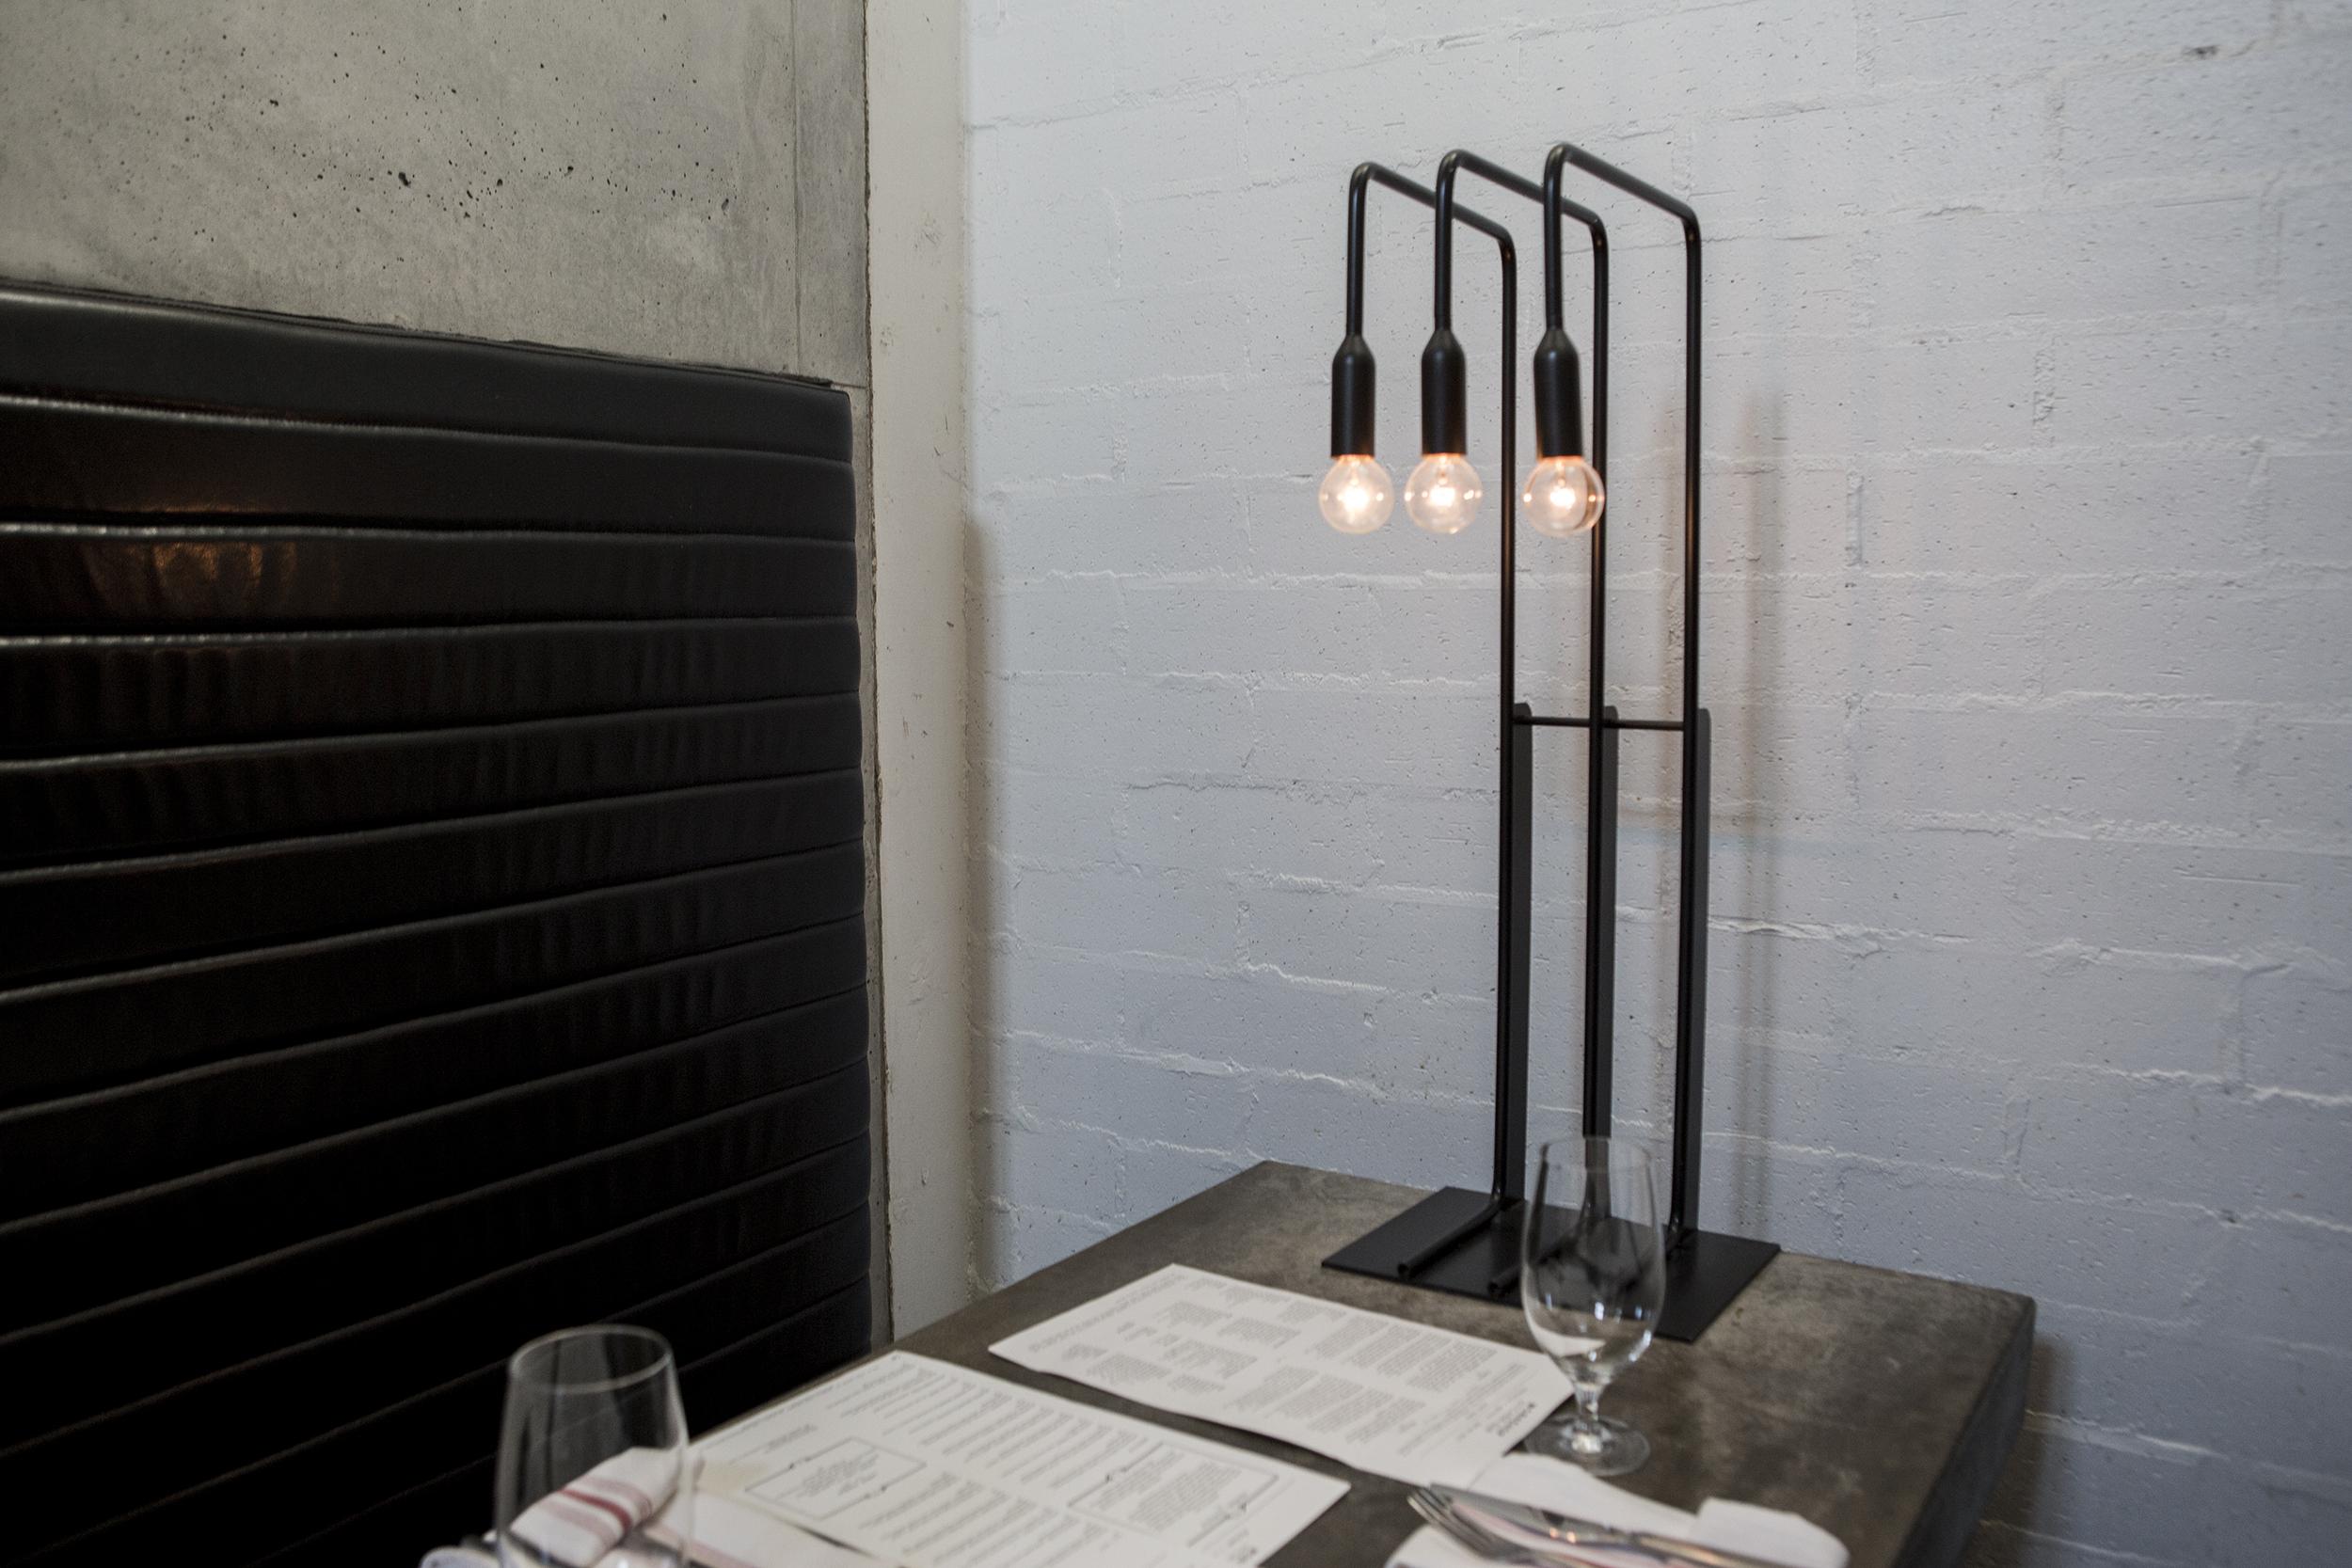 Workshop Kitchen Bar Nj In La